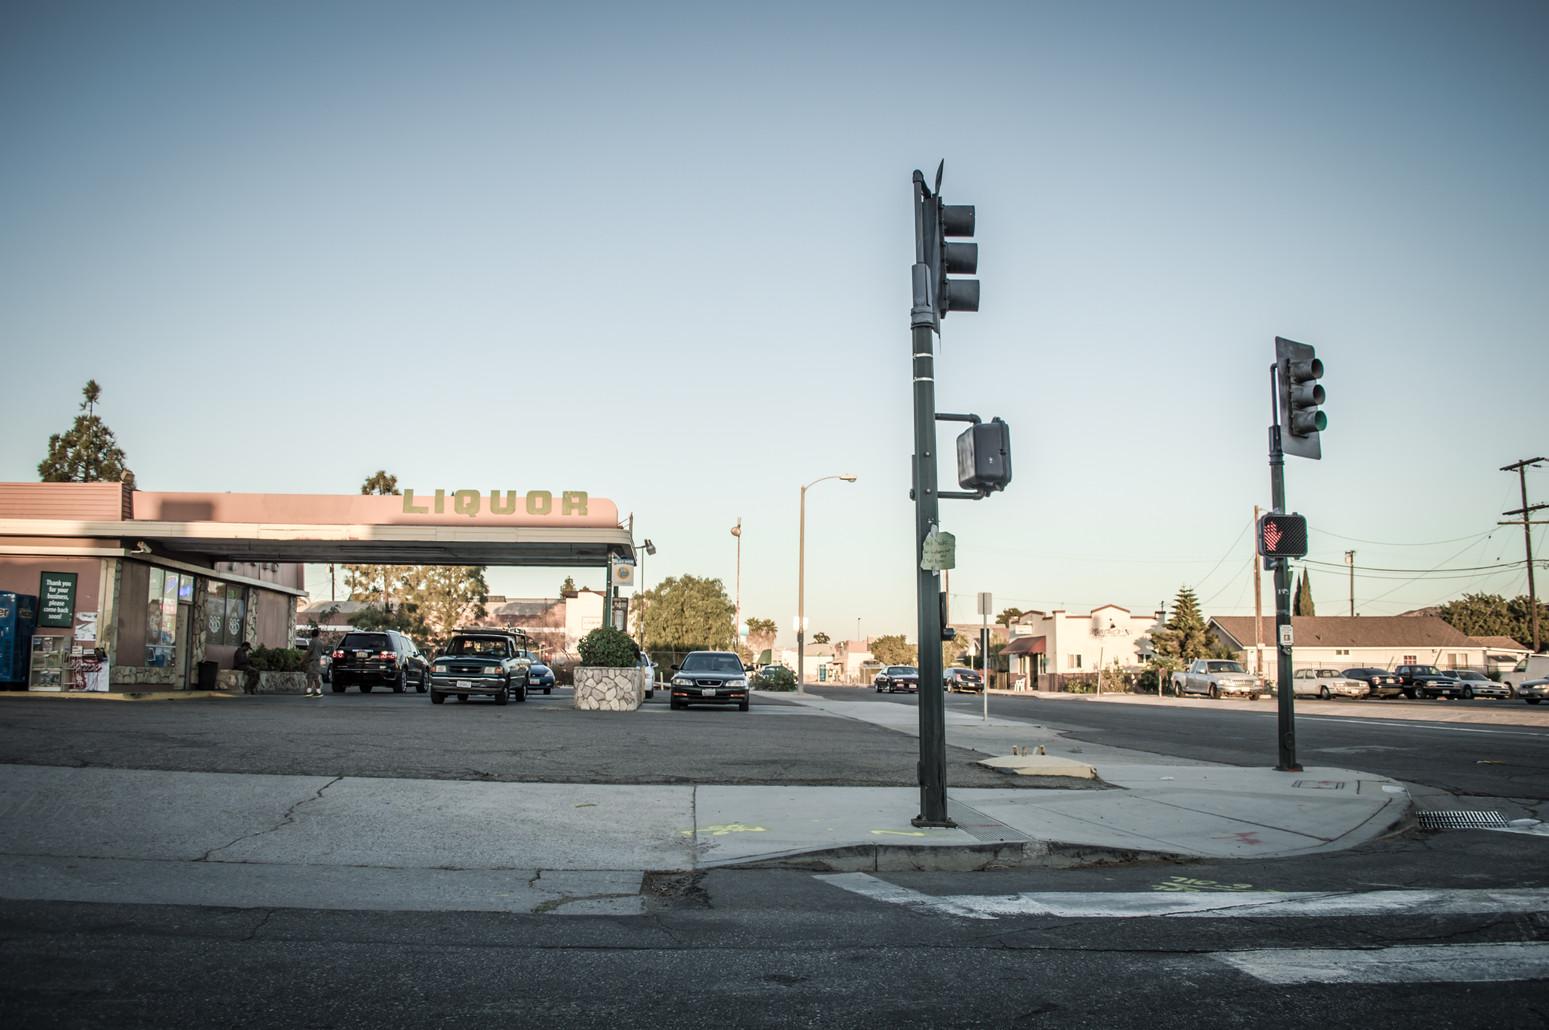 Drive-thru liquor in a backwater town in California.